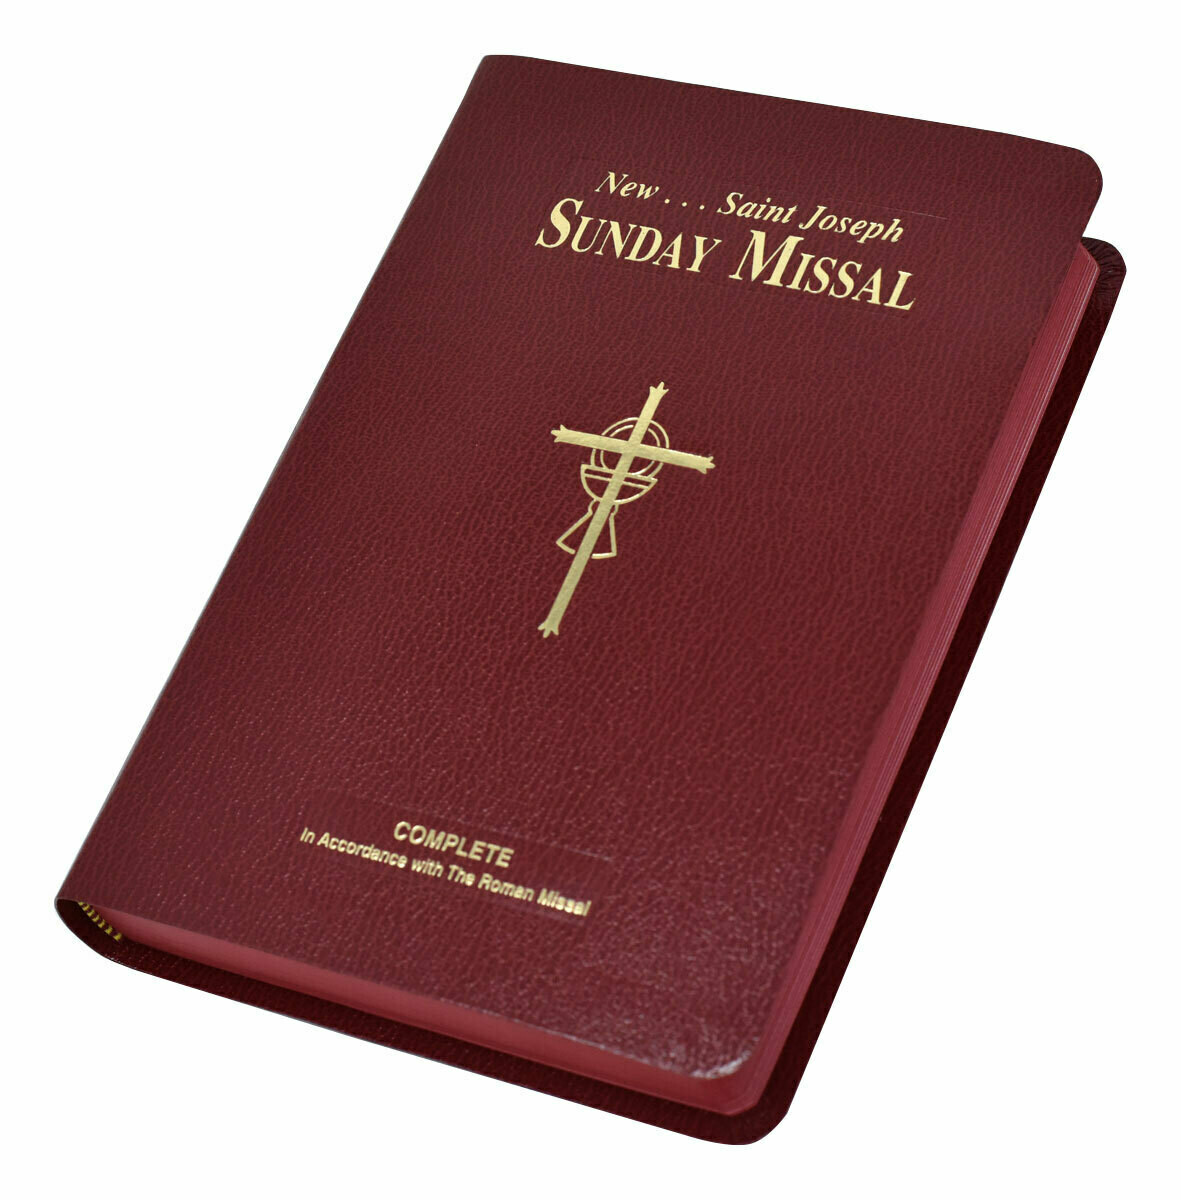 St Joseph Sunday Missal LP 822/10